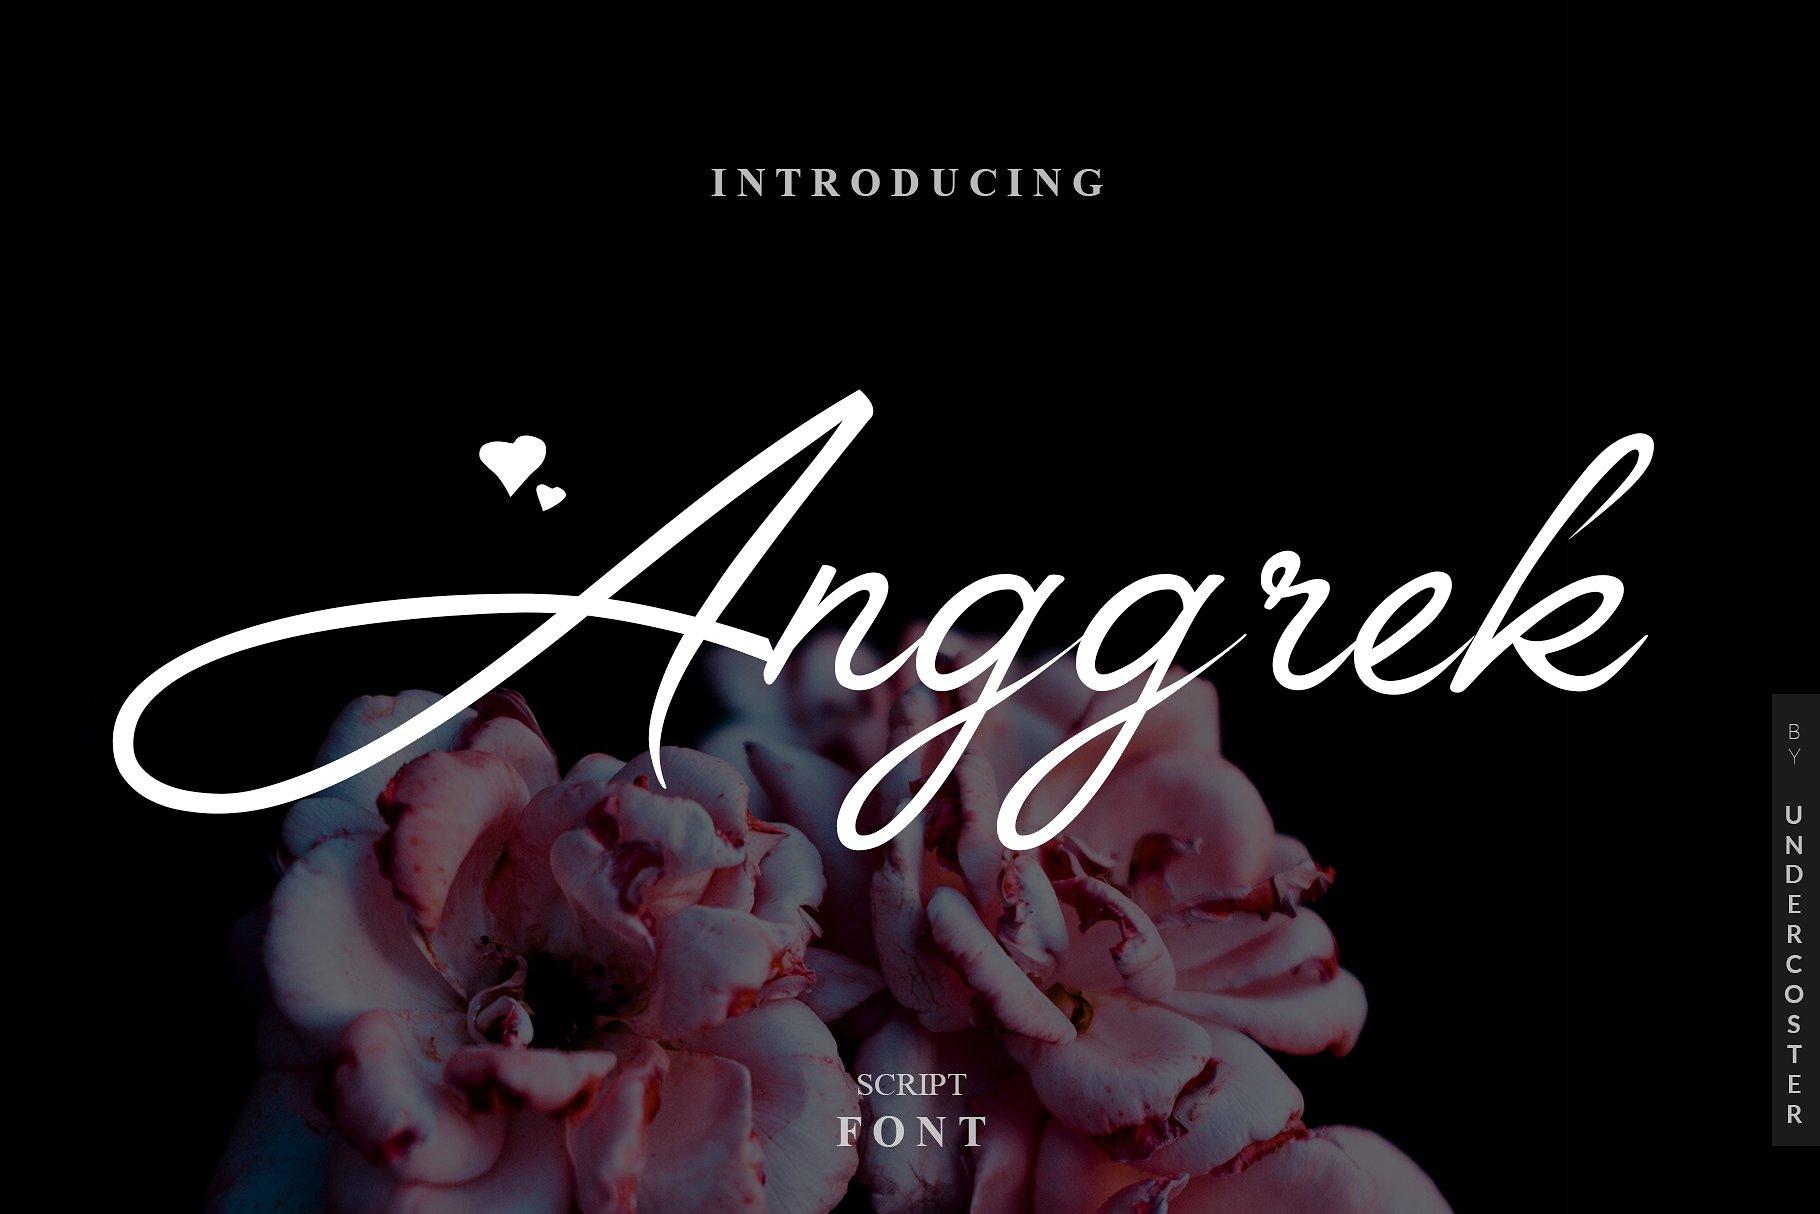 Anggrek Calligraphy